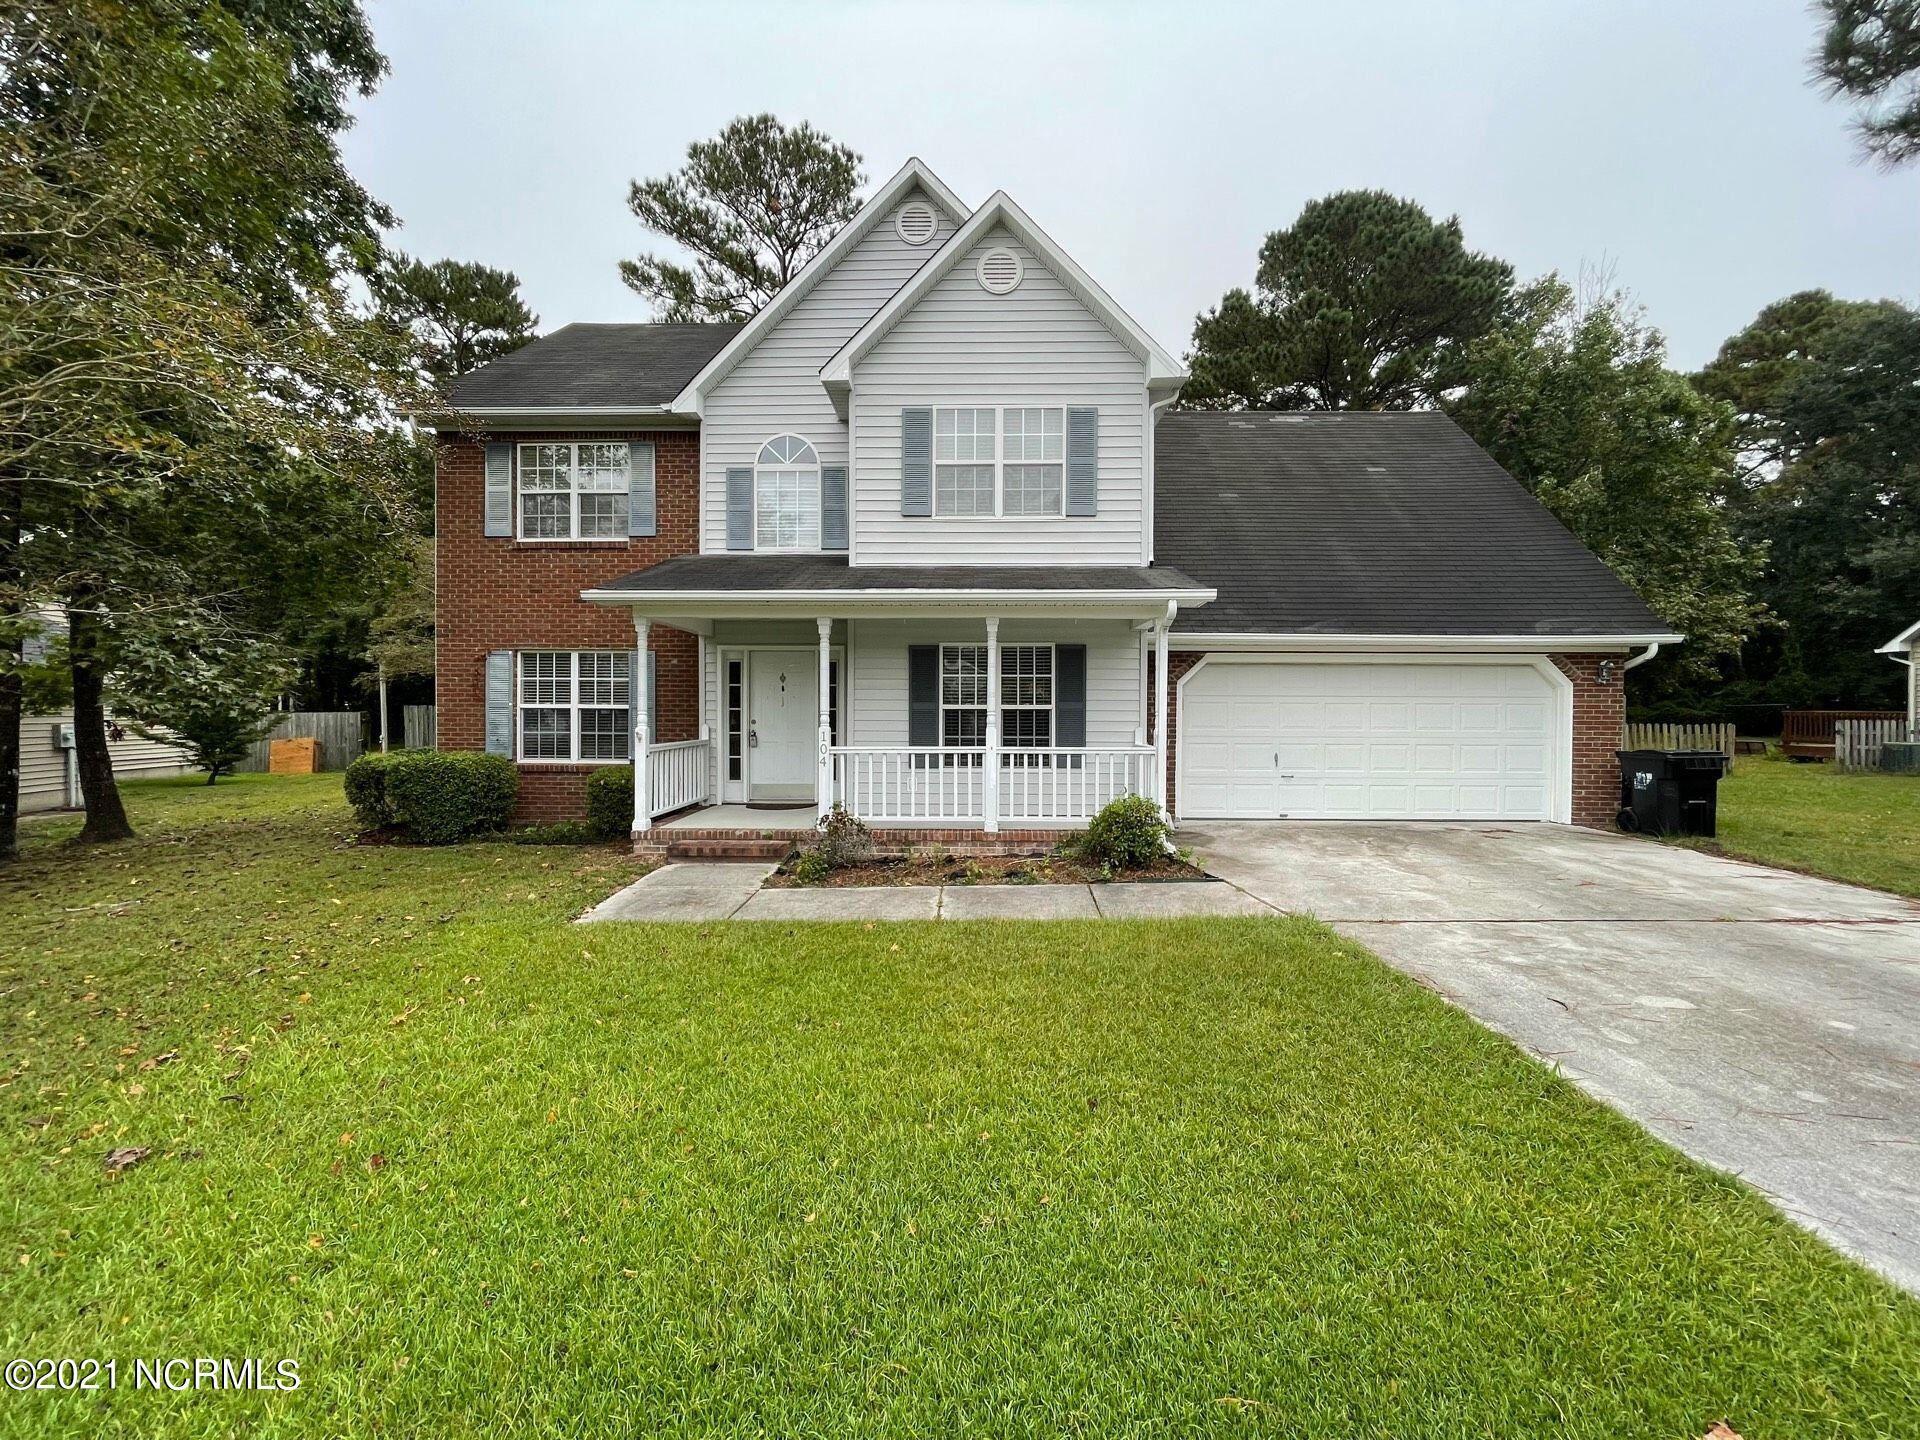 Photo of 104 Dunwoody Drive, Jacksonville, NC 28546 (MLS # 100294835)